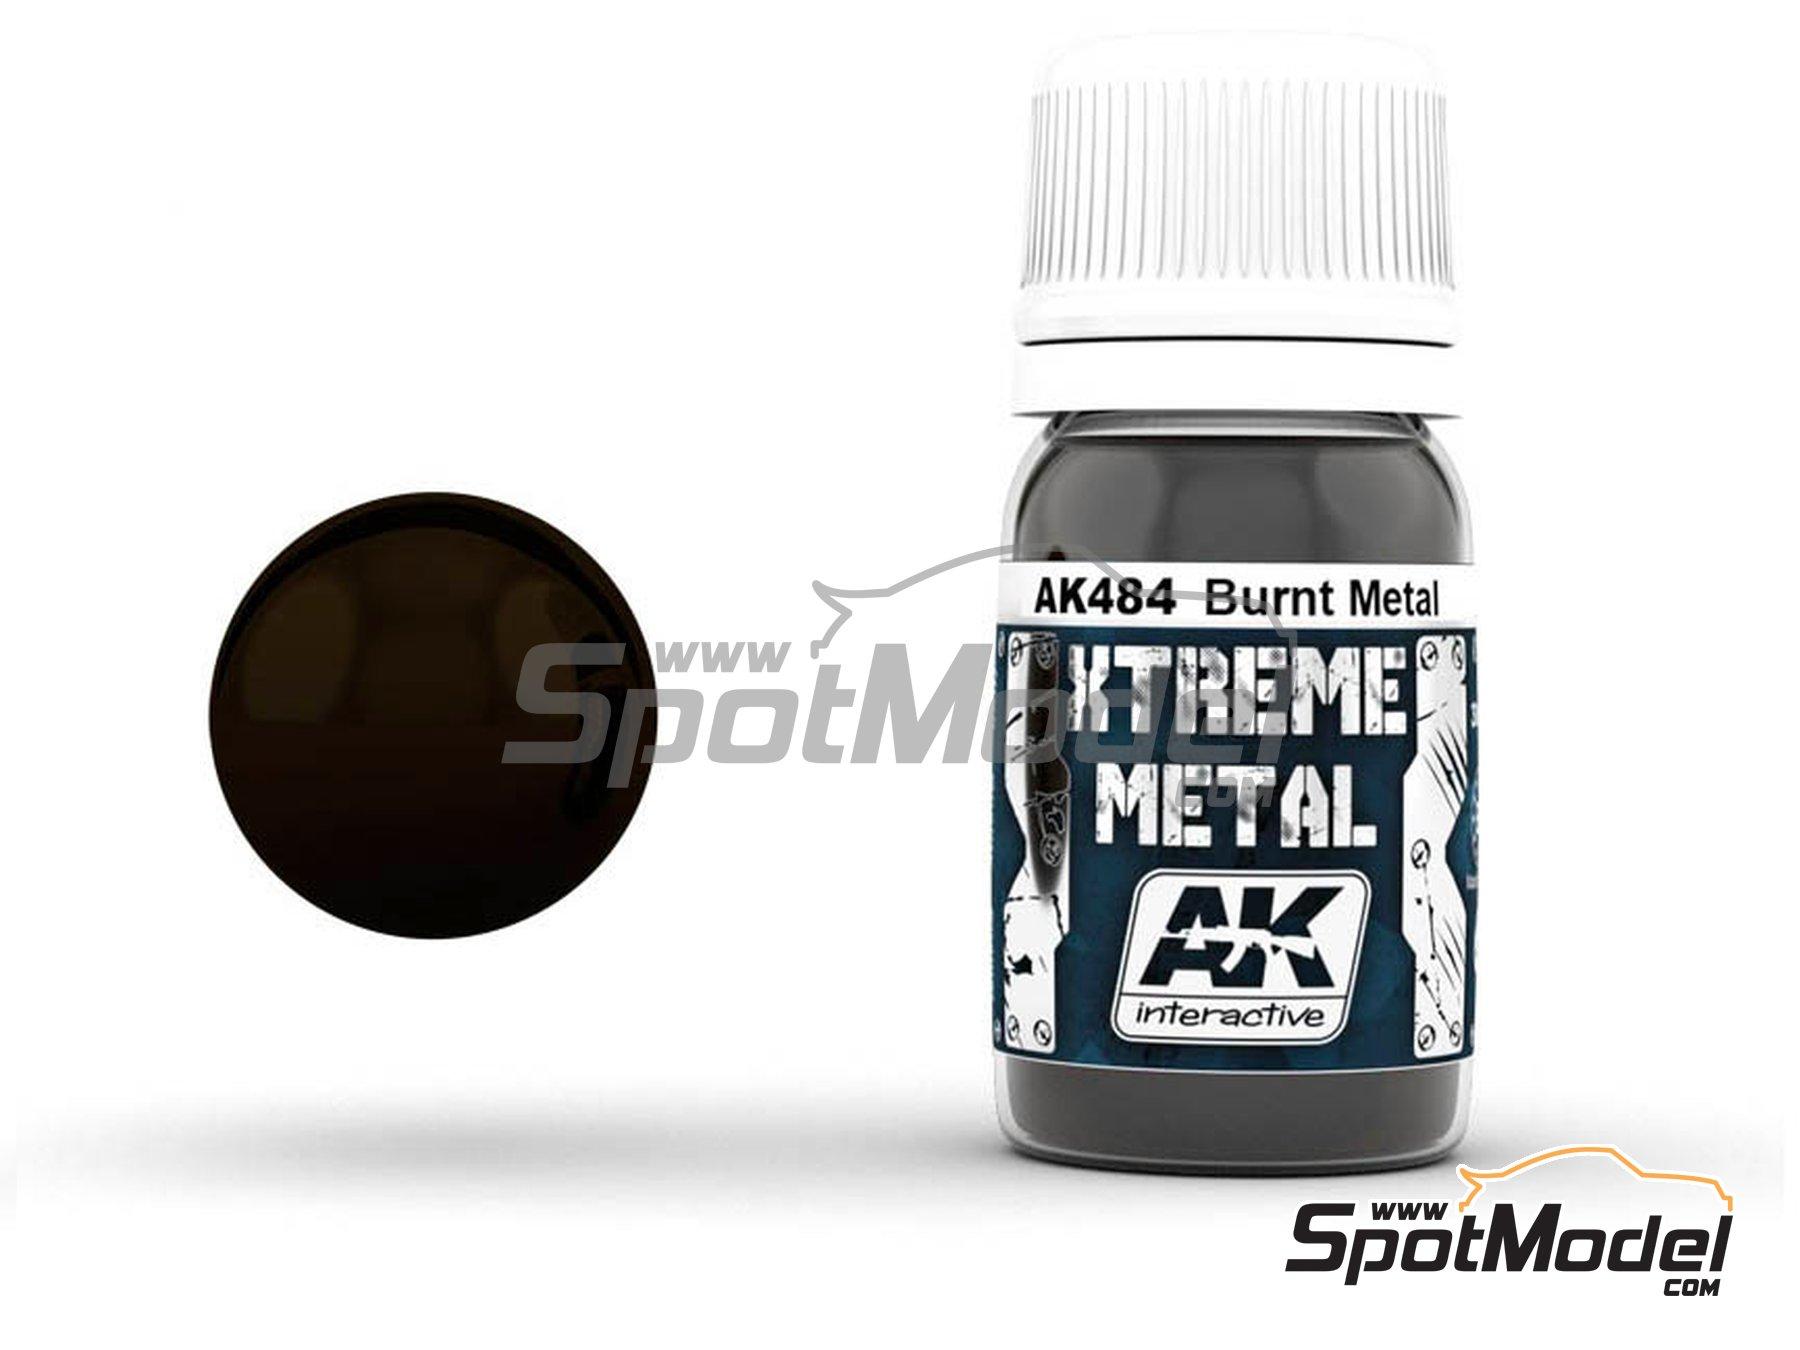 Image 1: Burnt metal | Xtreme metal paint manufactured by AK Interactive (ref.AK-484)